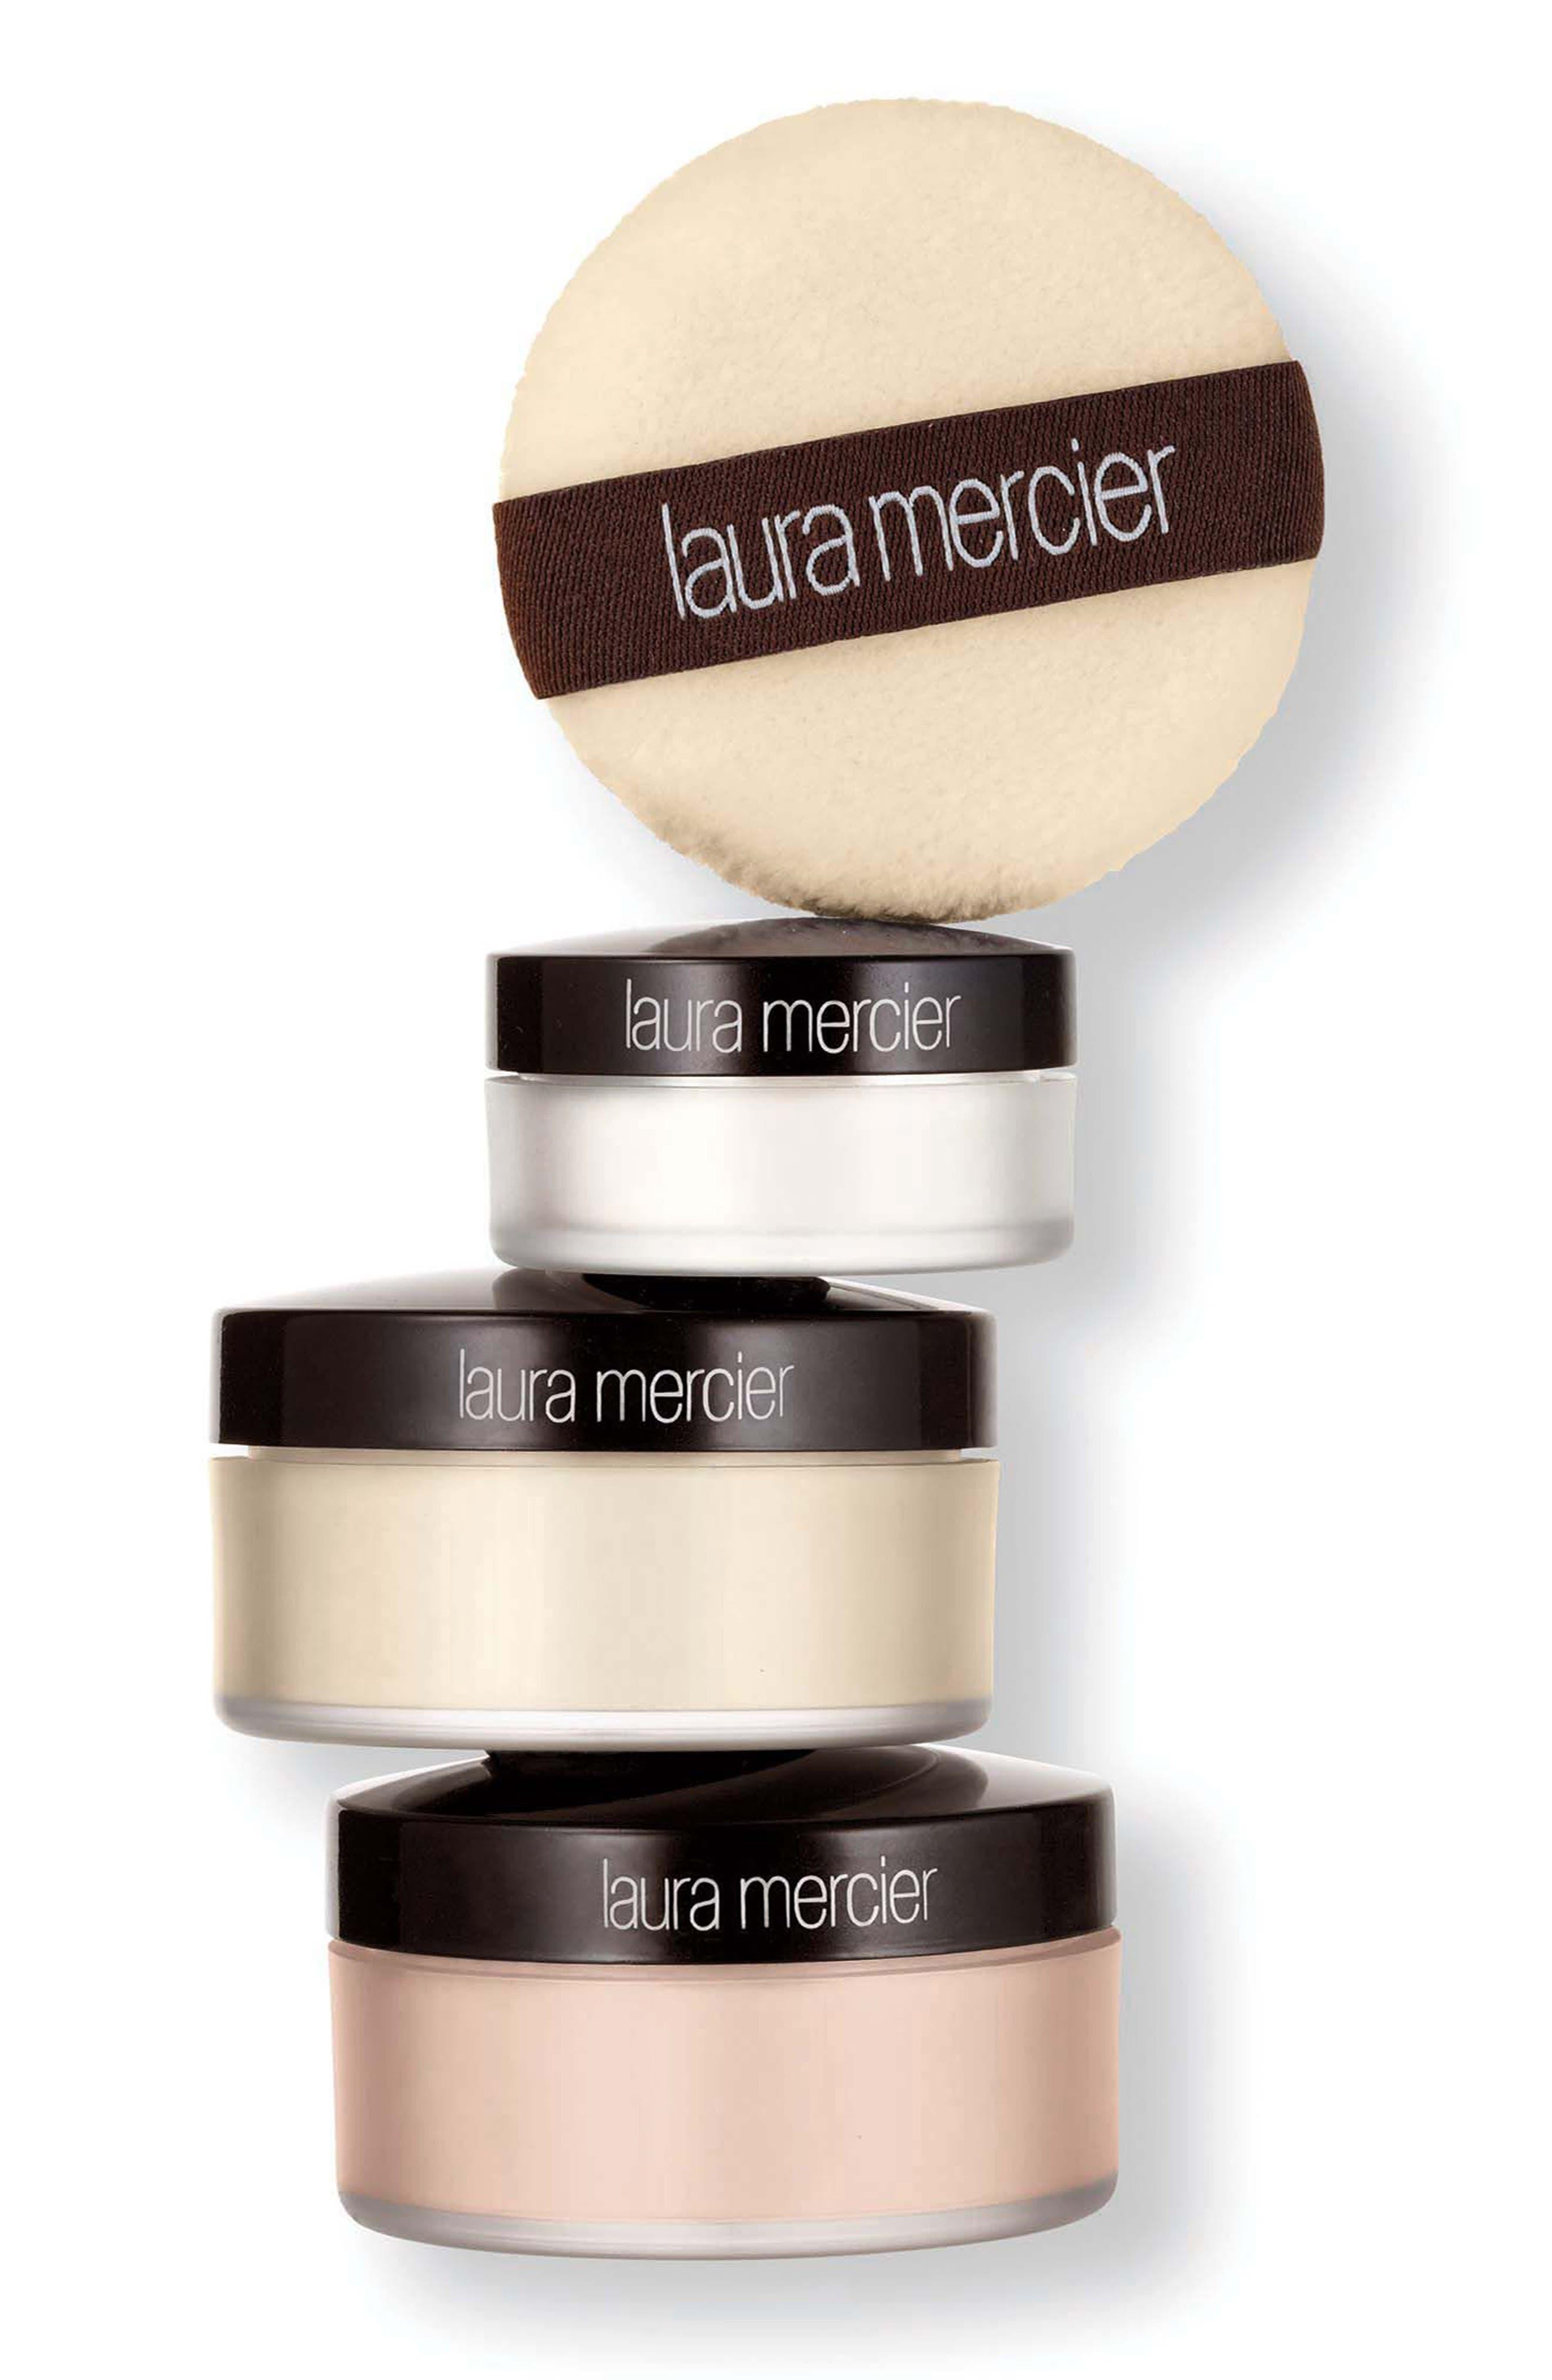 Communication on this topic: Laura Mercier mini setting powder, laura-mercier-mini-setting-powder/